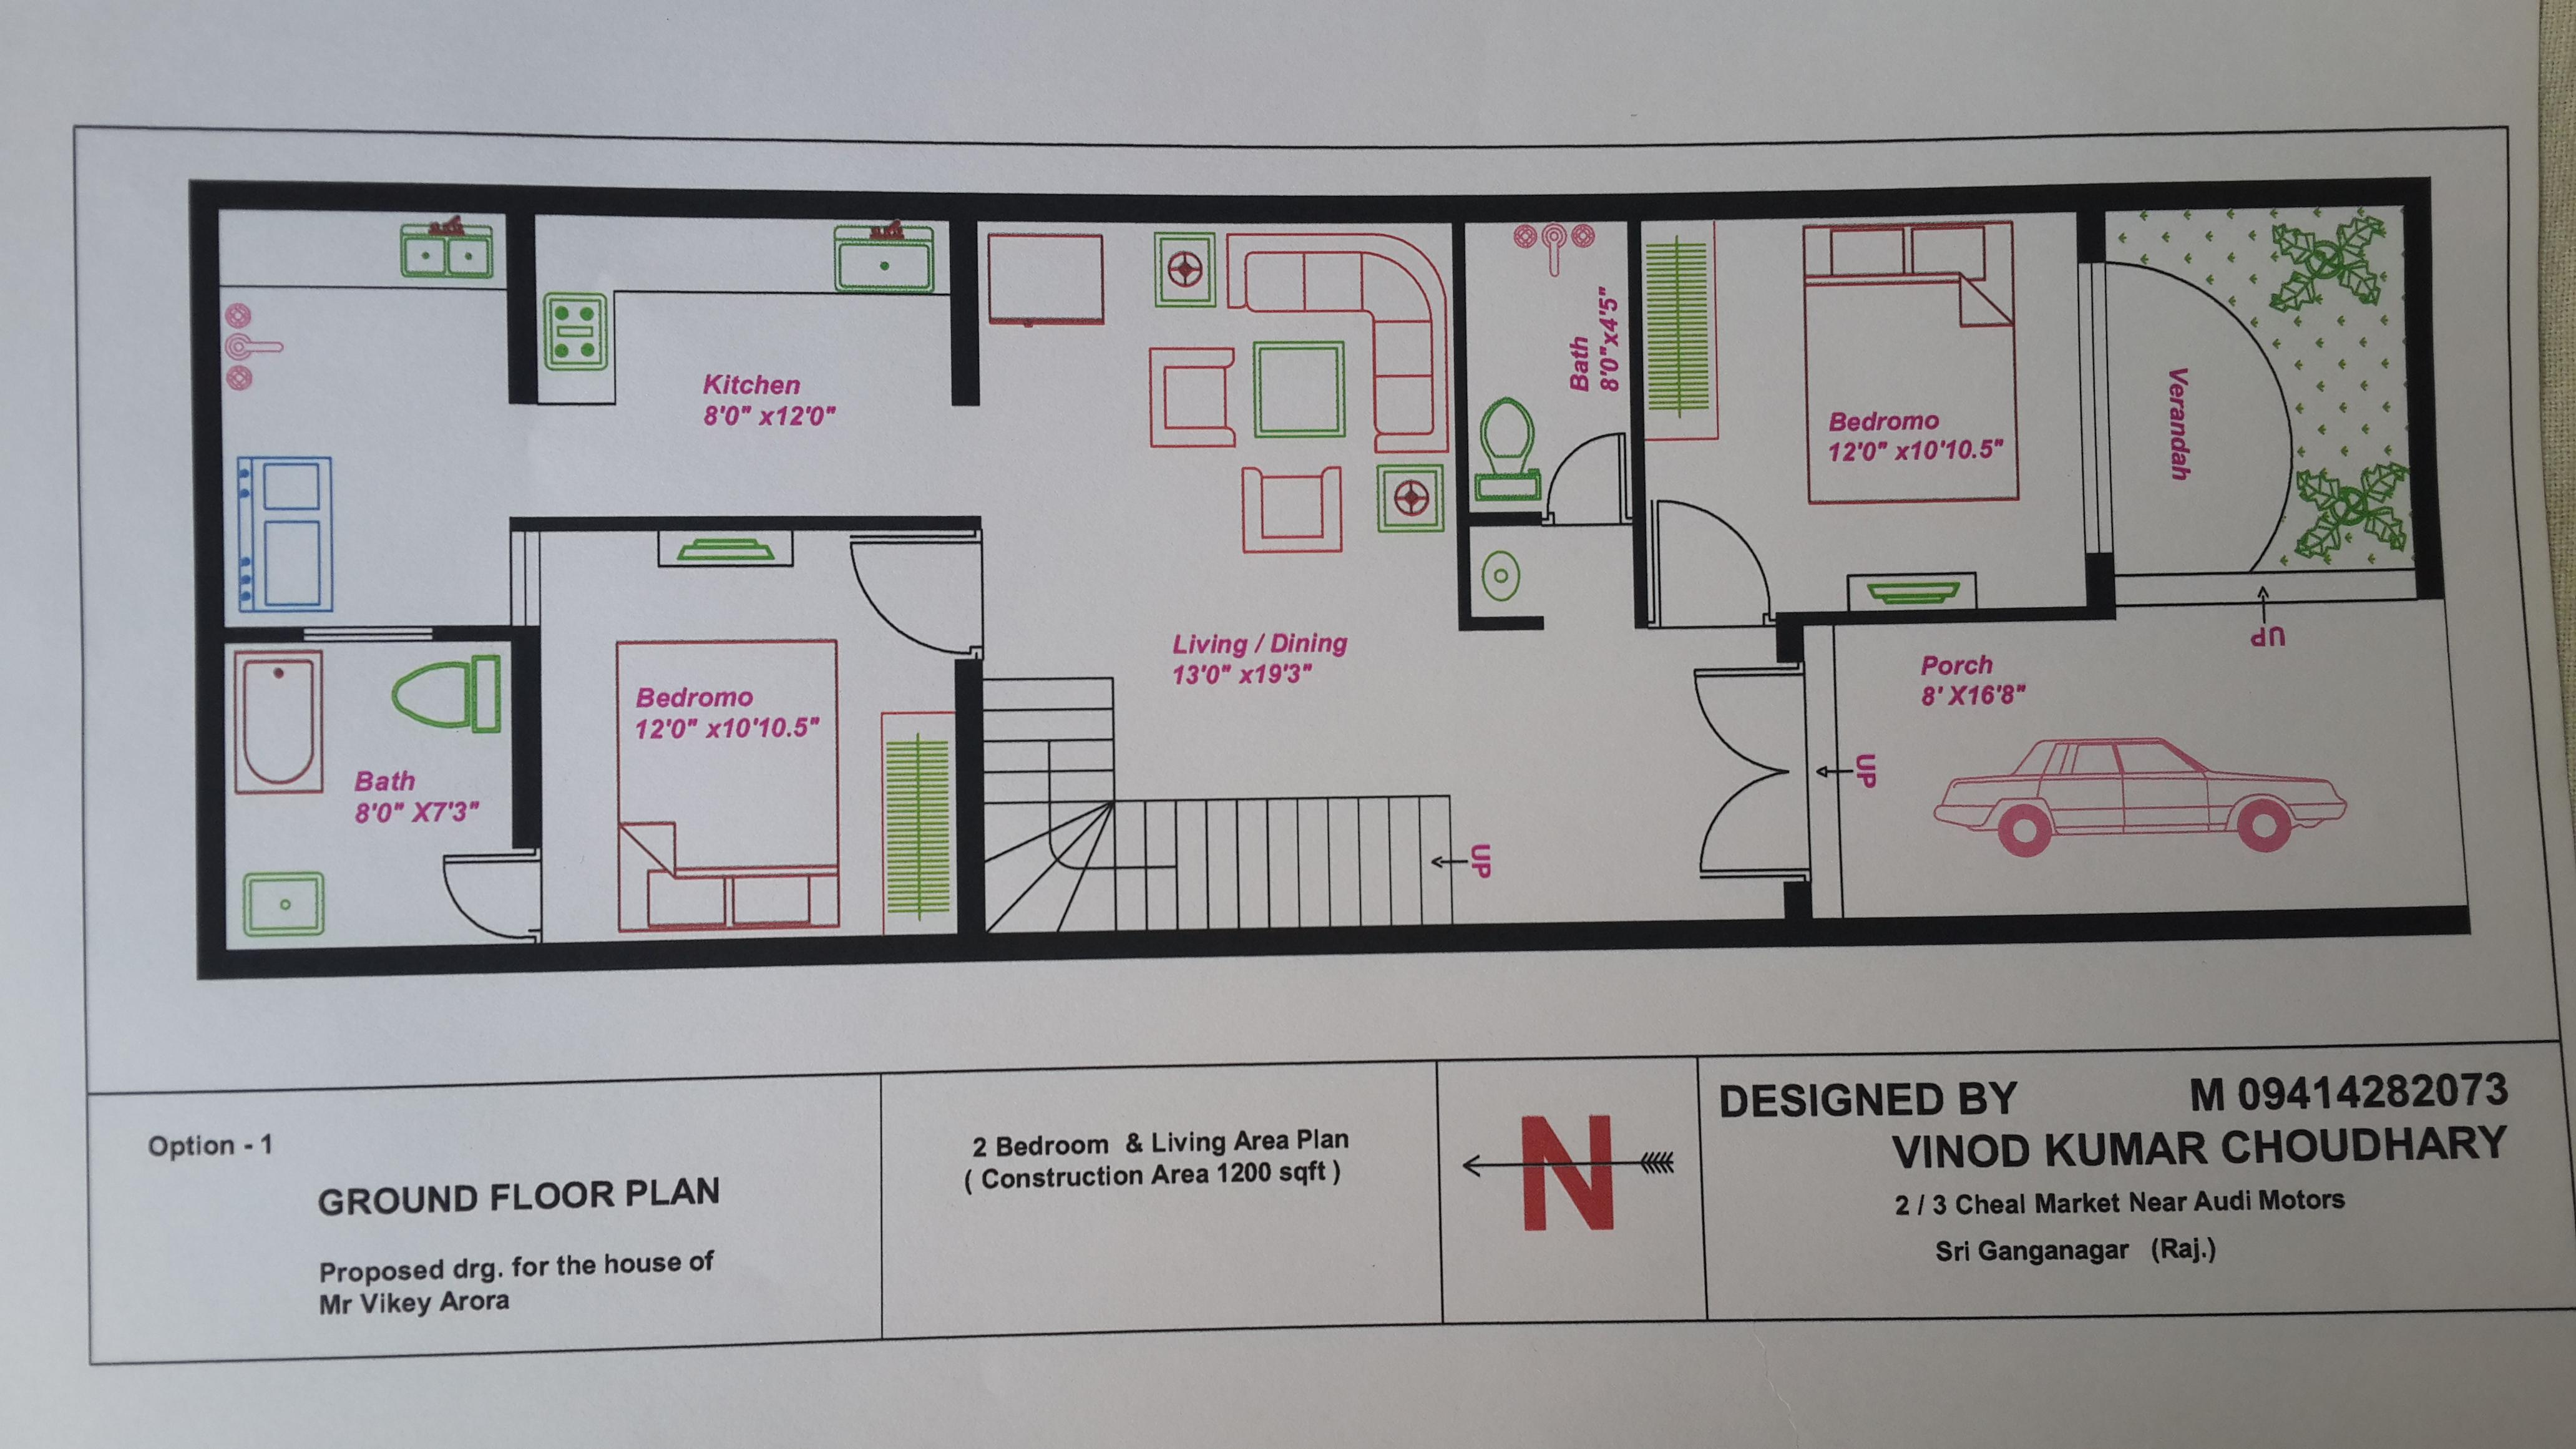 Home Design 100 Gaj Part - 45: Home Design 100 Gaj Home Design In 100 Gaj By 100 Design 500 Sq